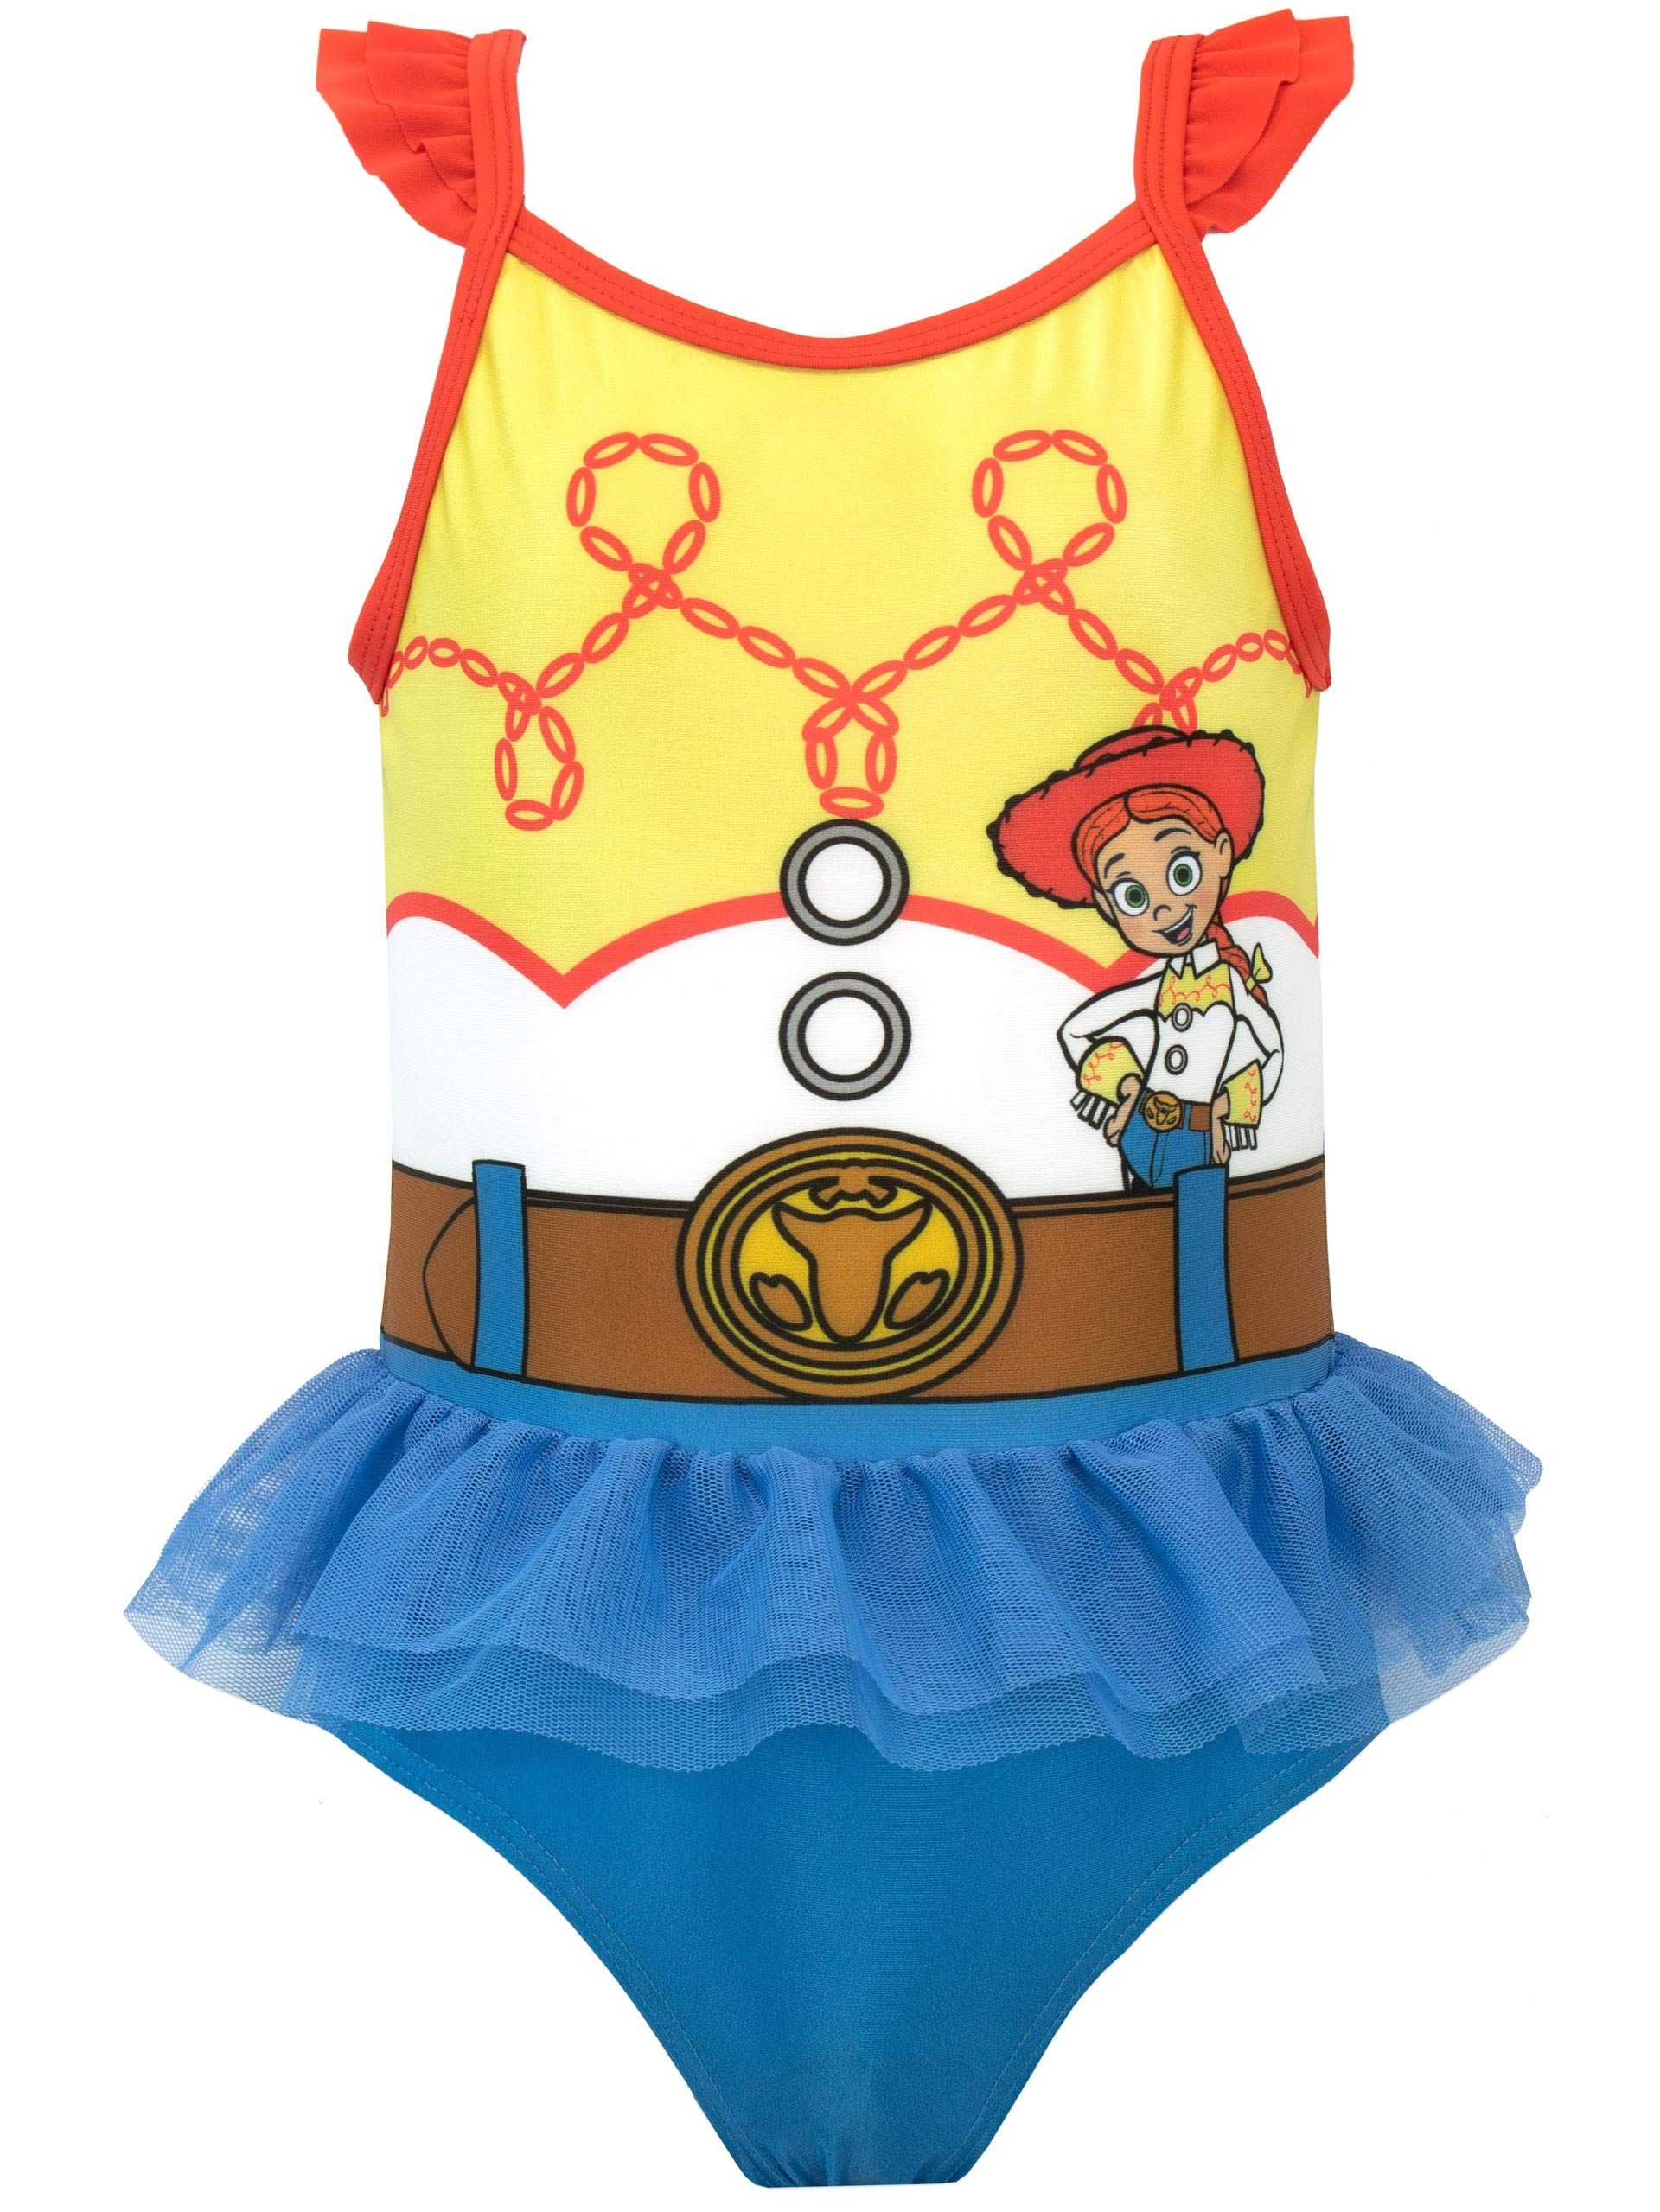 Girls Official Licensed Disney Moana Swimwear Swimsuit Swimming Costume